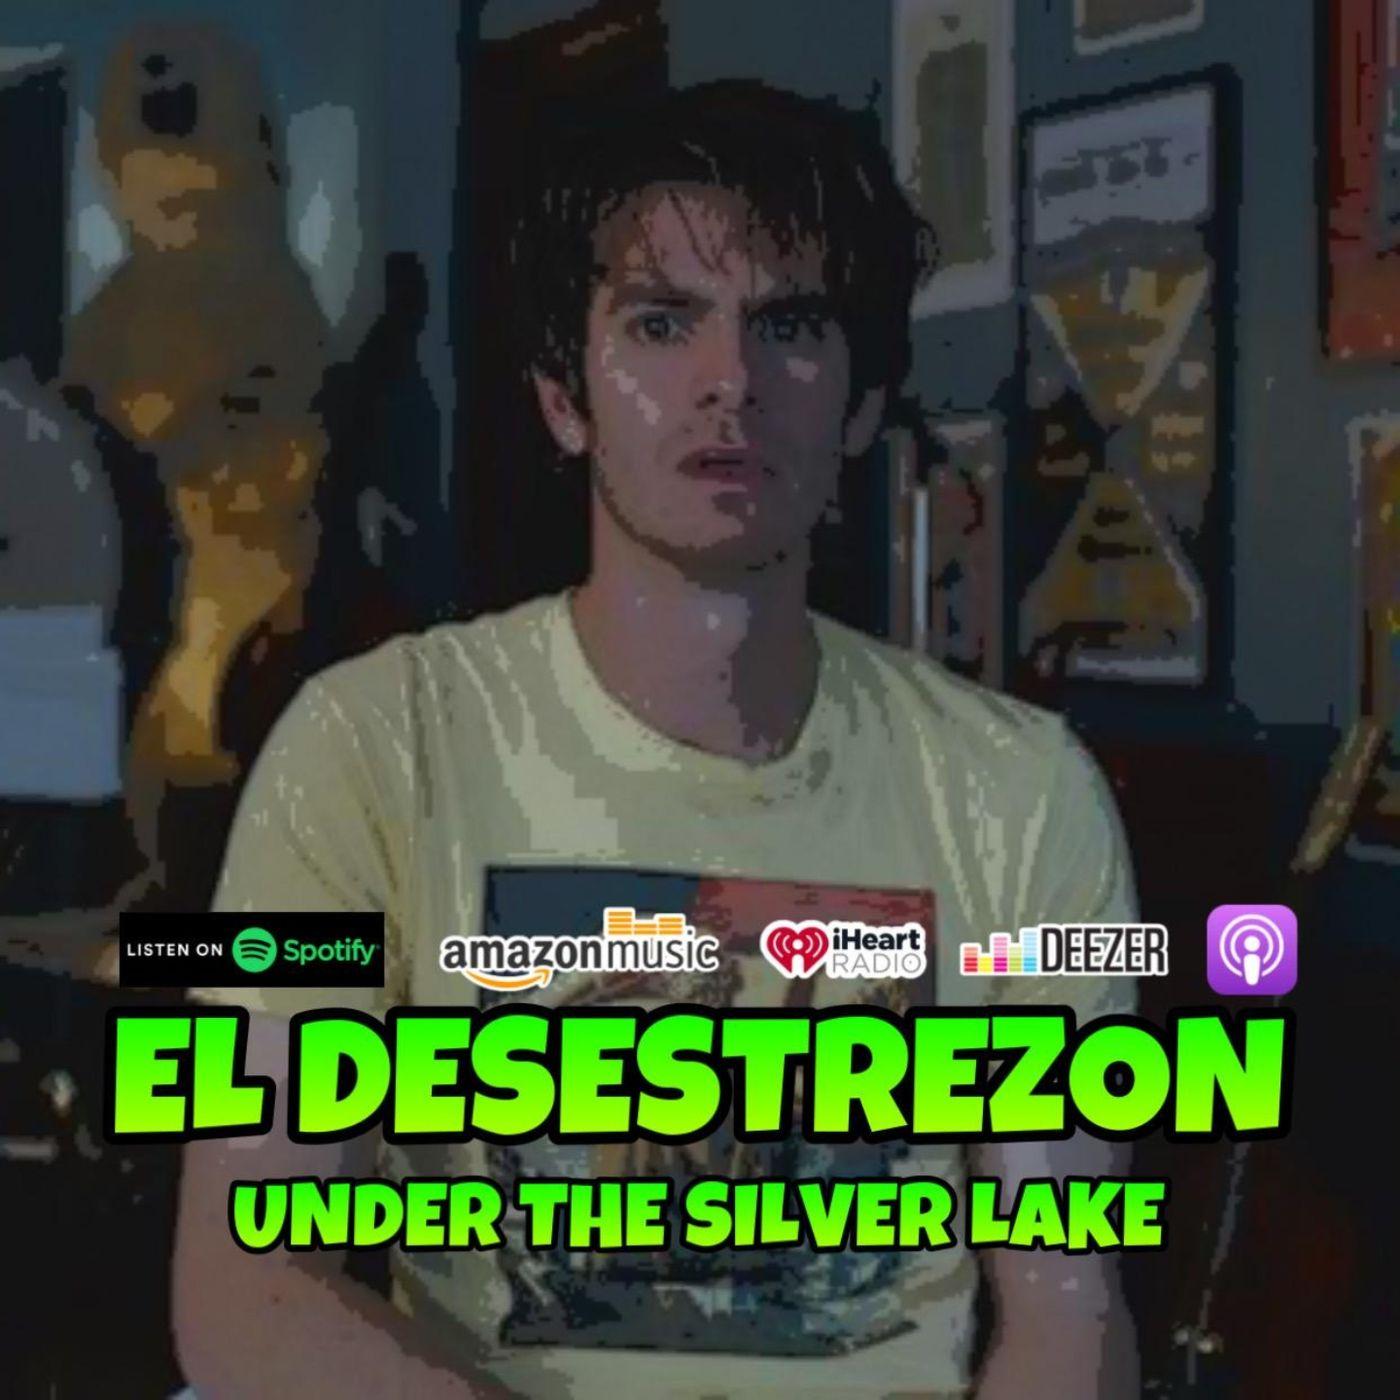 El Desestrezon #UnderTheSilverLake